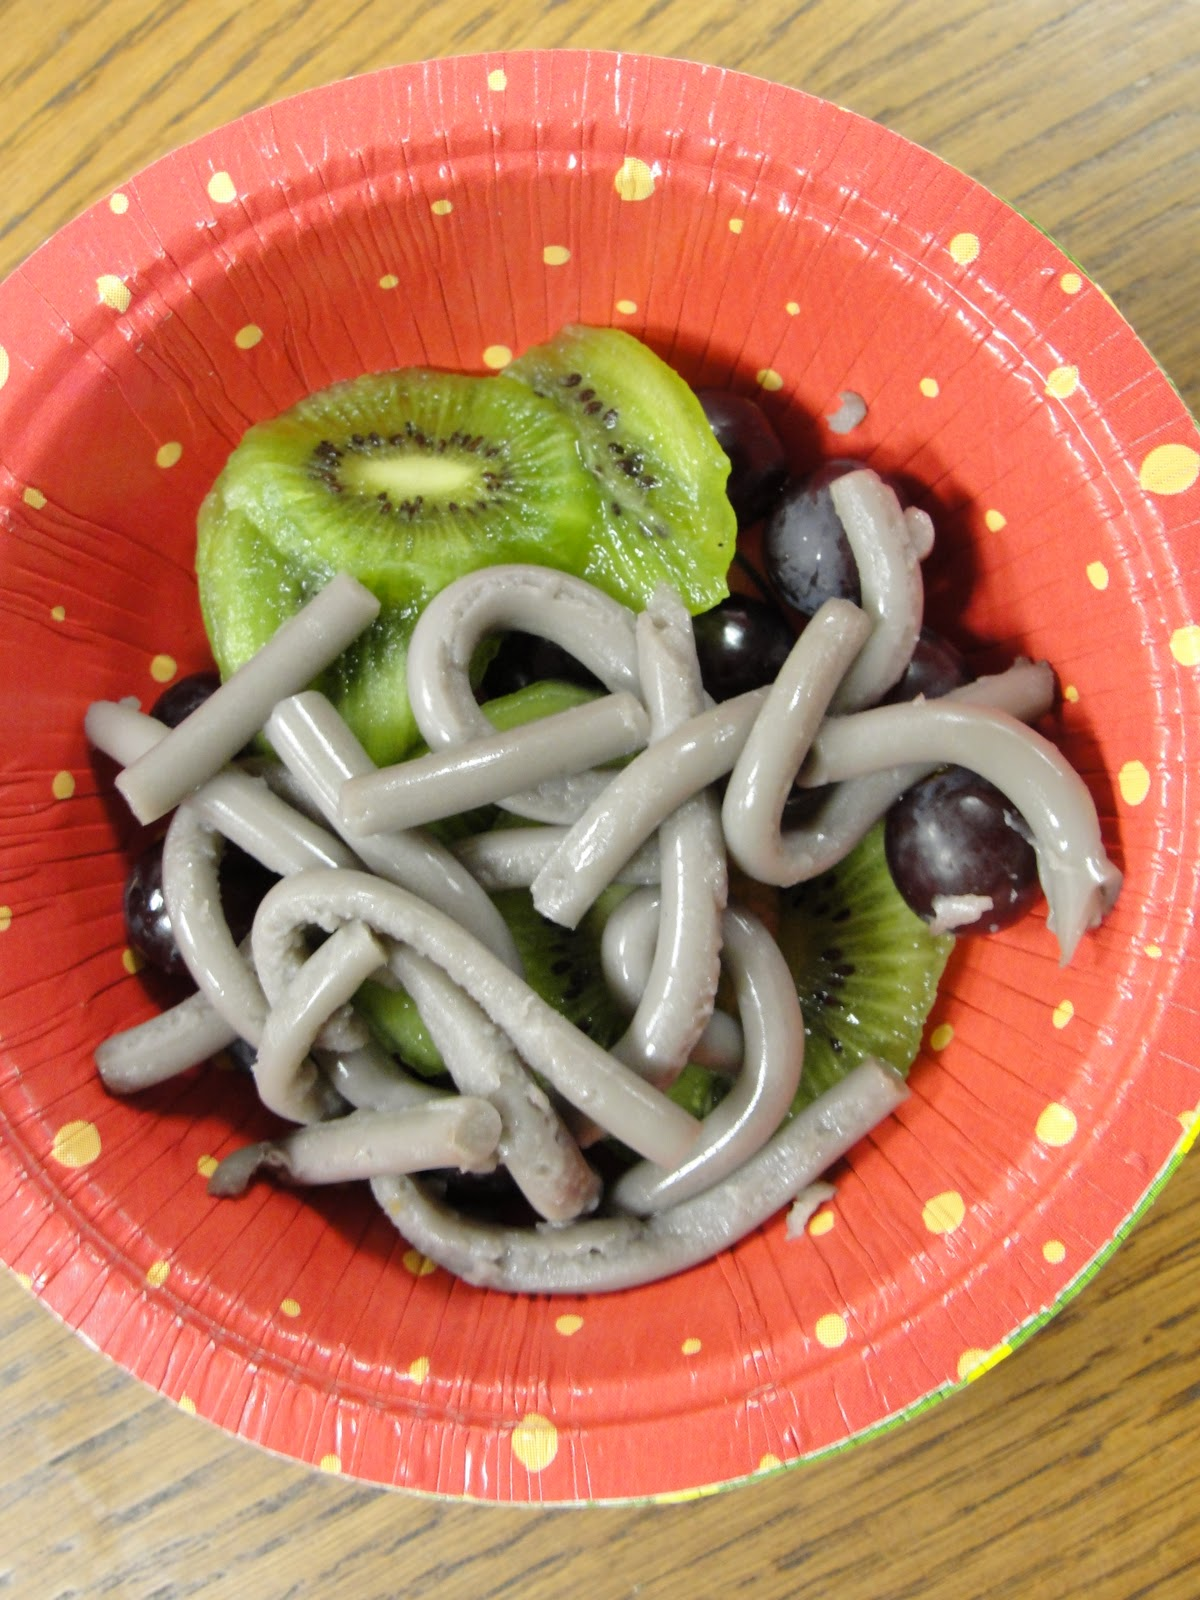 Gaia Garden Girl Making Wiggly Gelatin Earthworms